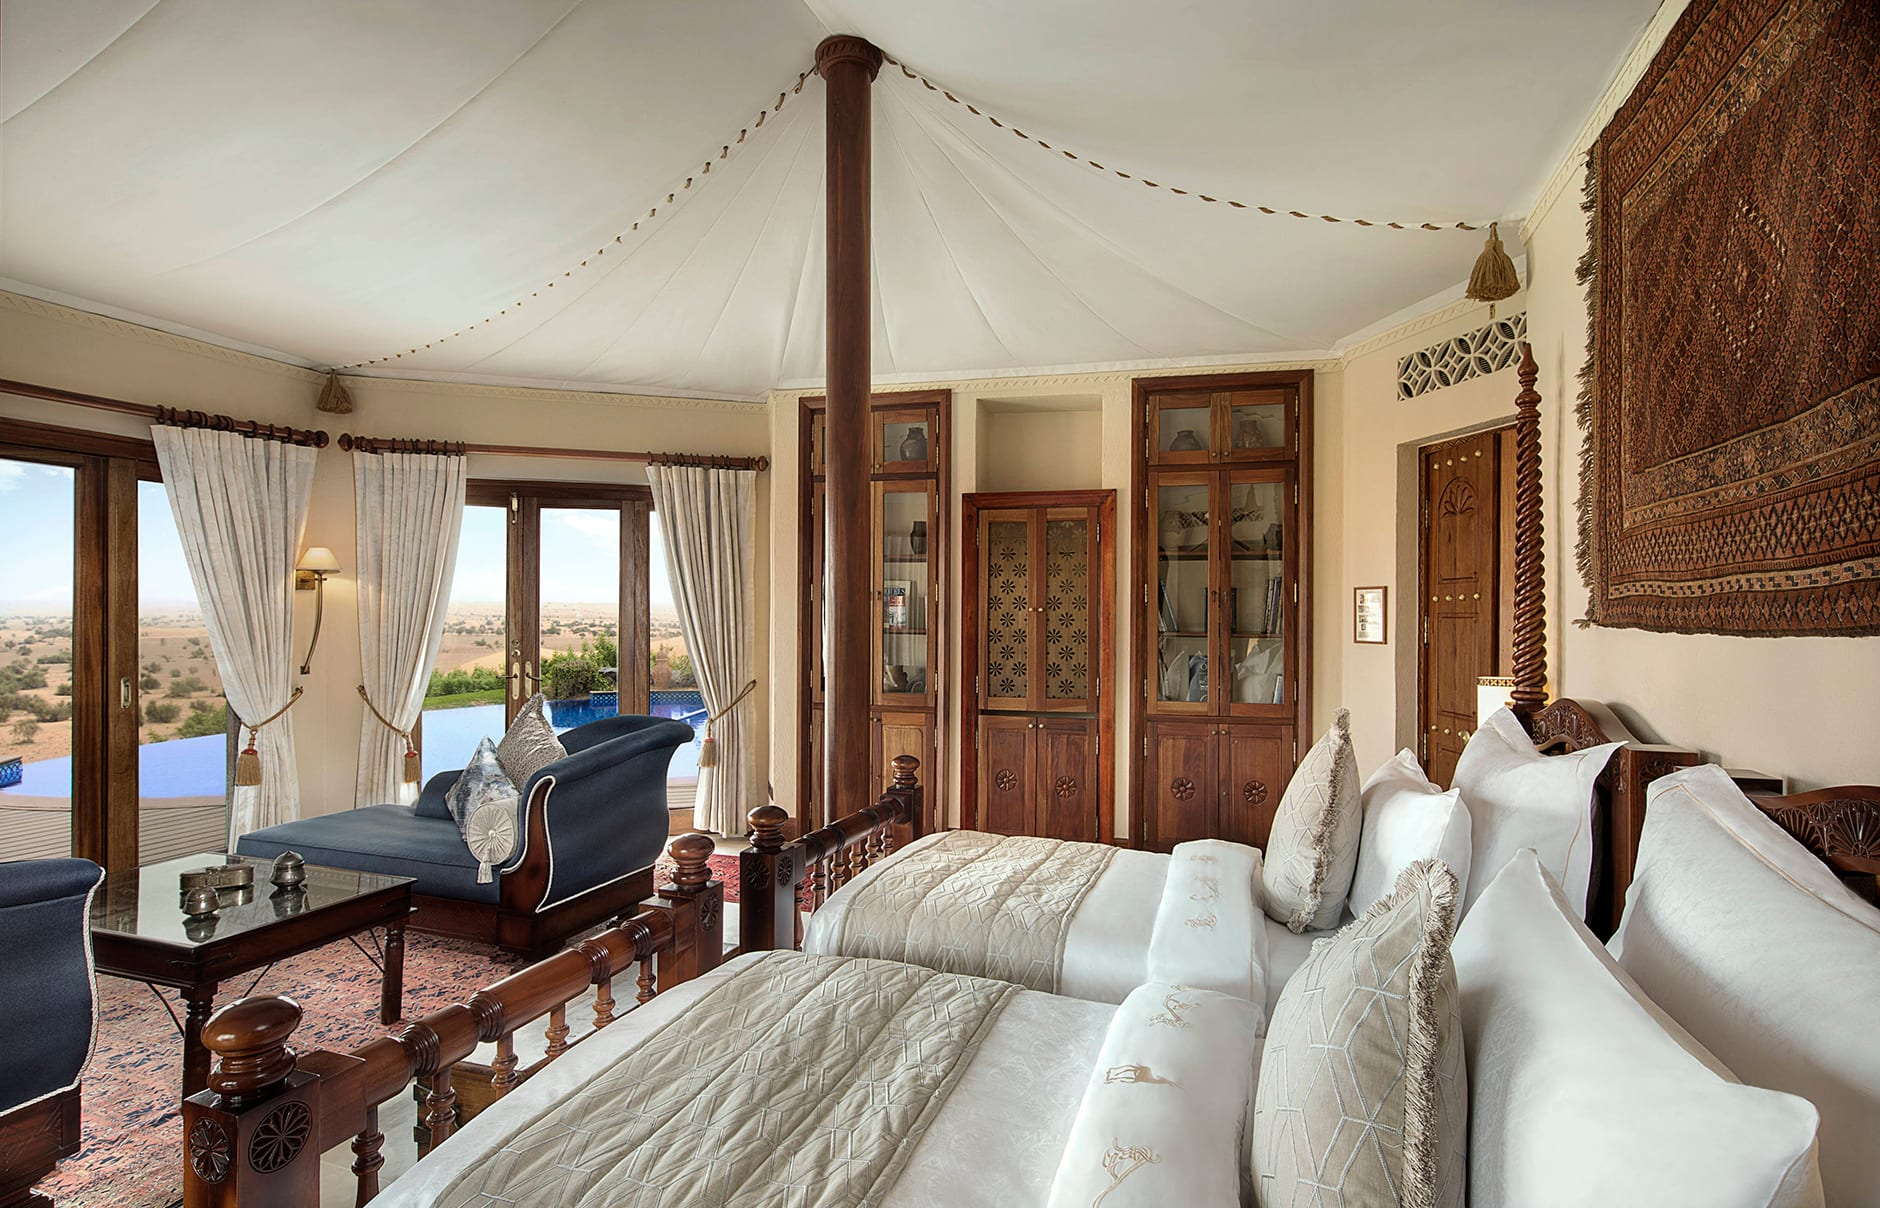 Al Maha, a Luxury Collection Desert Resort & Spa, Dubai, UAE. Review by TravelPlusStyle. Photo © Marriott International